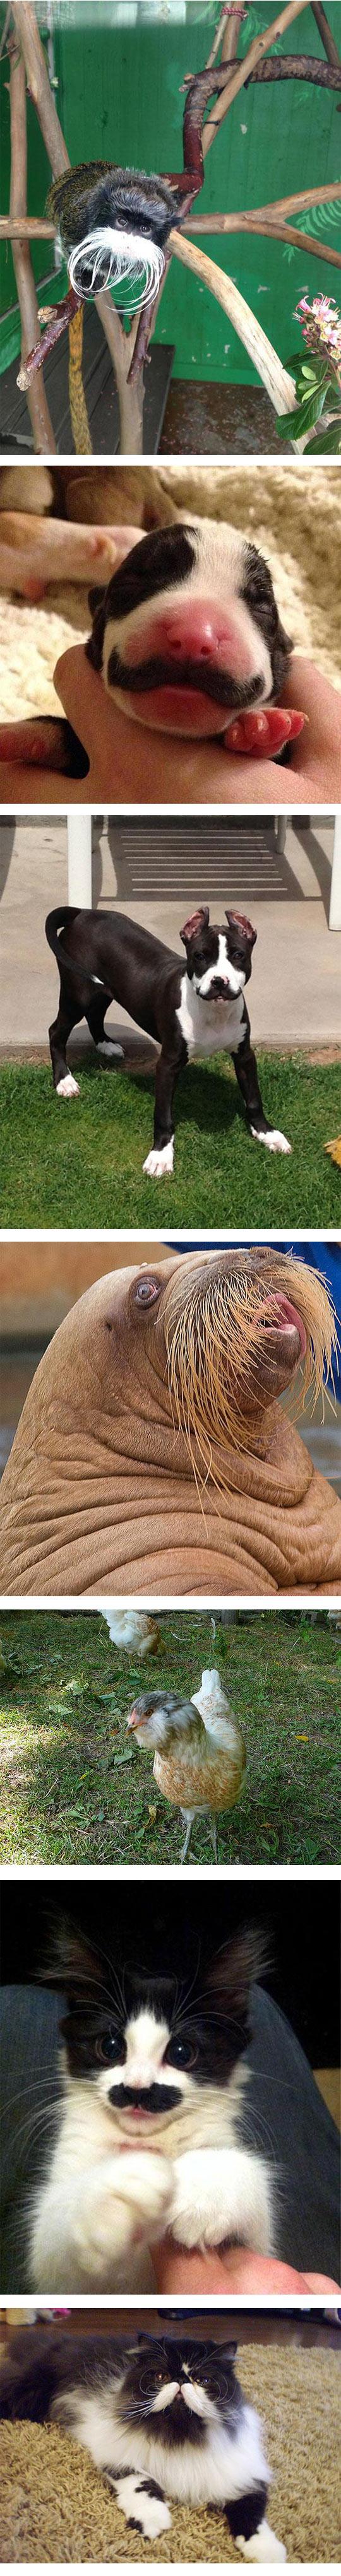 funny-beard-cat-dog-animals